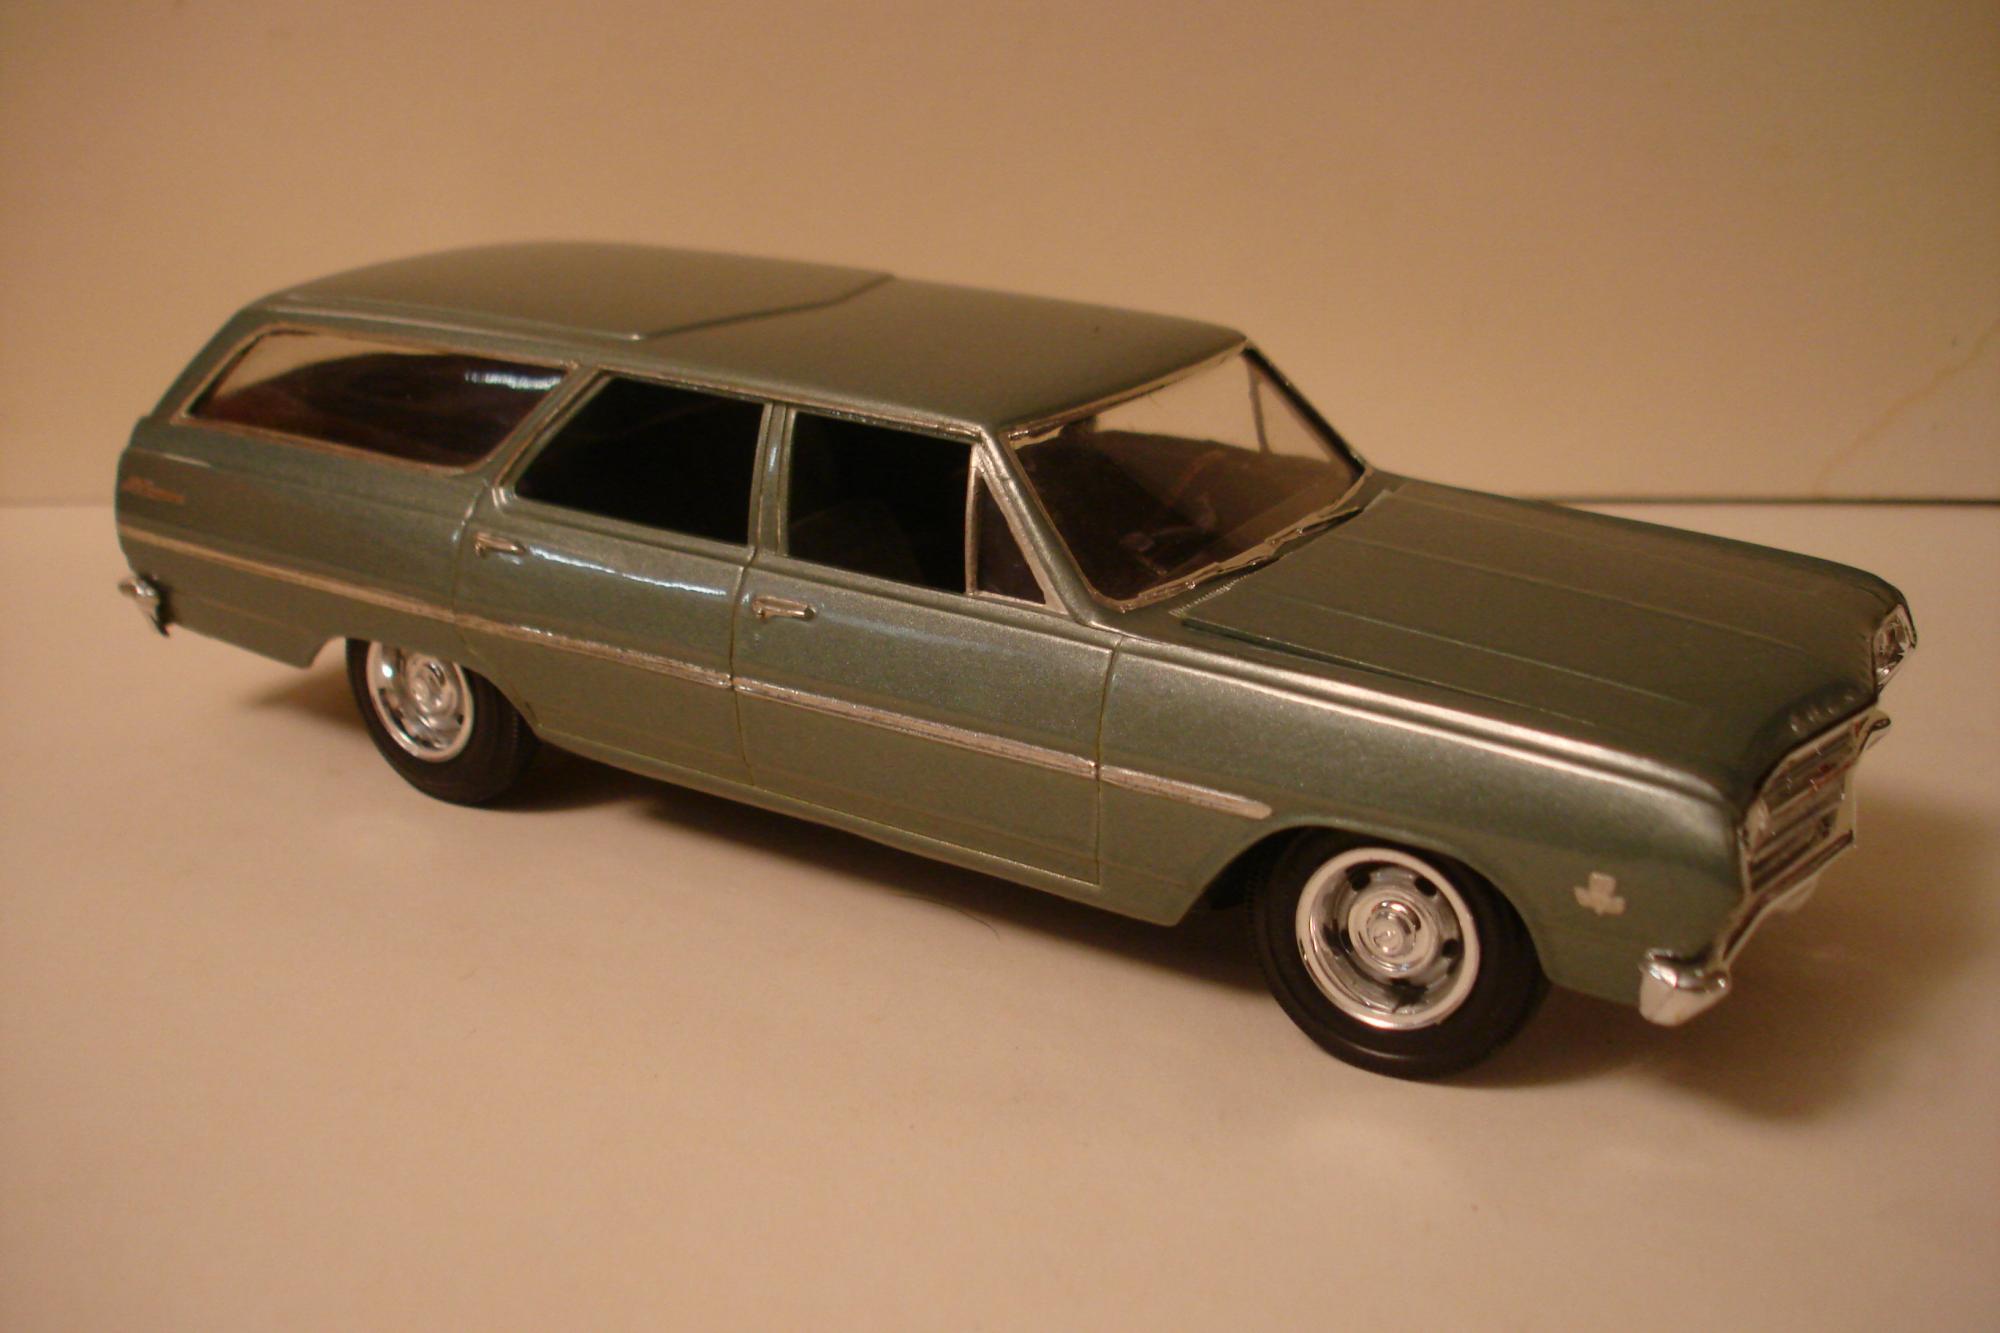 AMT 1965 Malibu wagon - Under Glass - Model Cars Magazine Forum